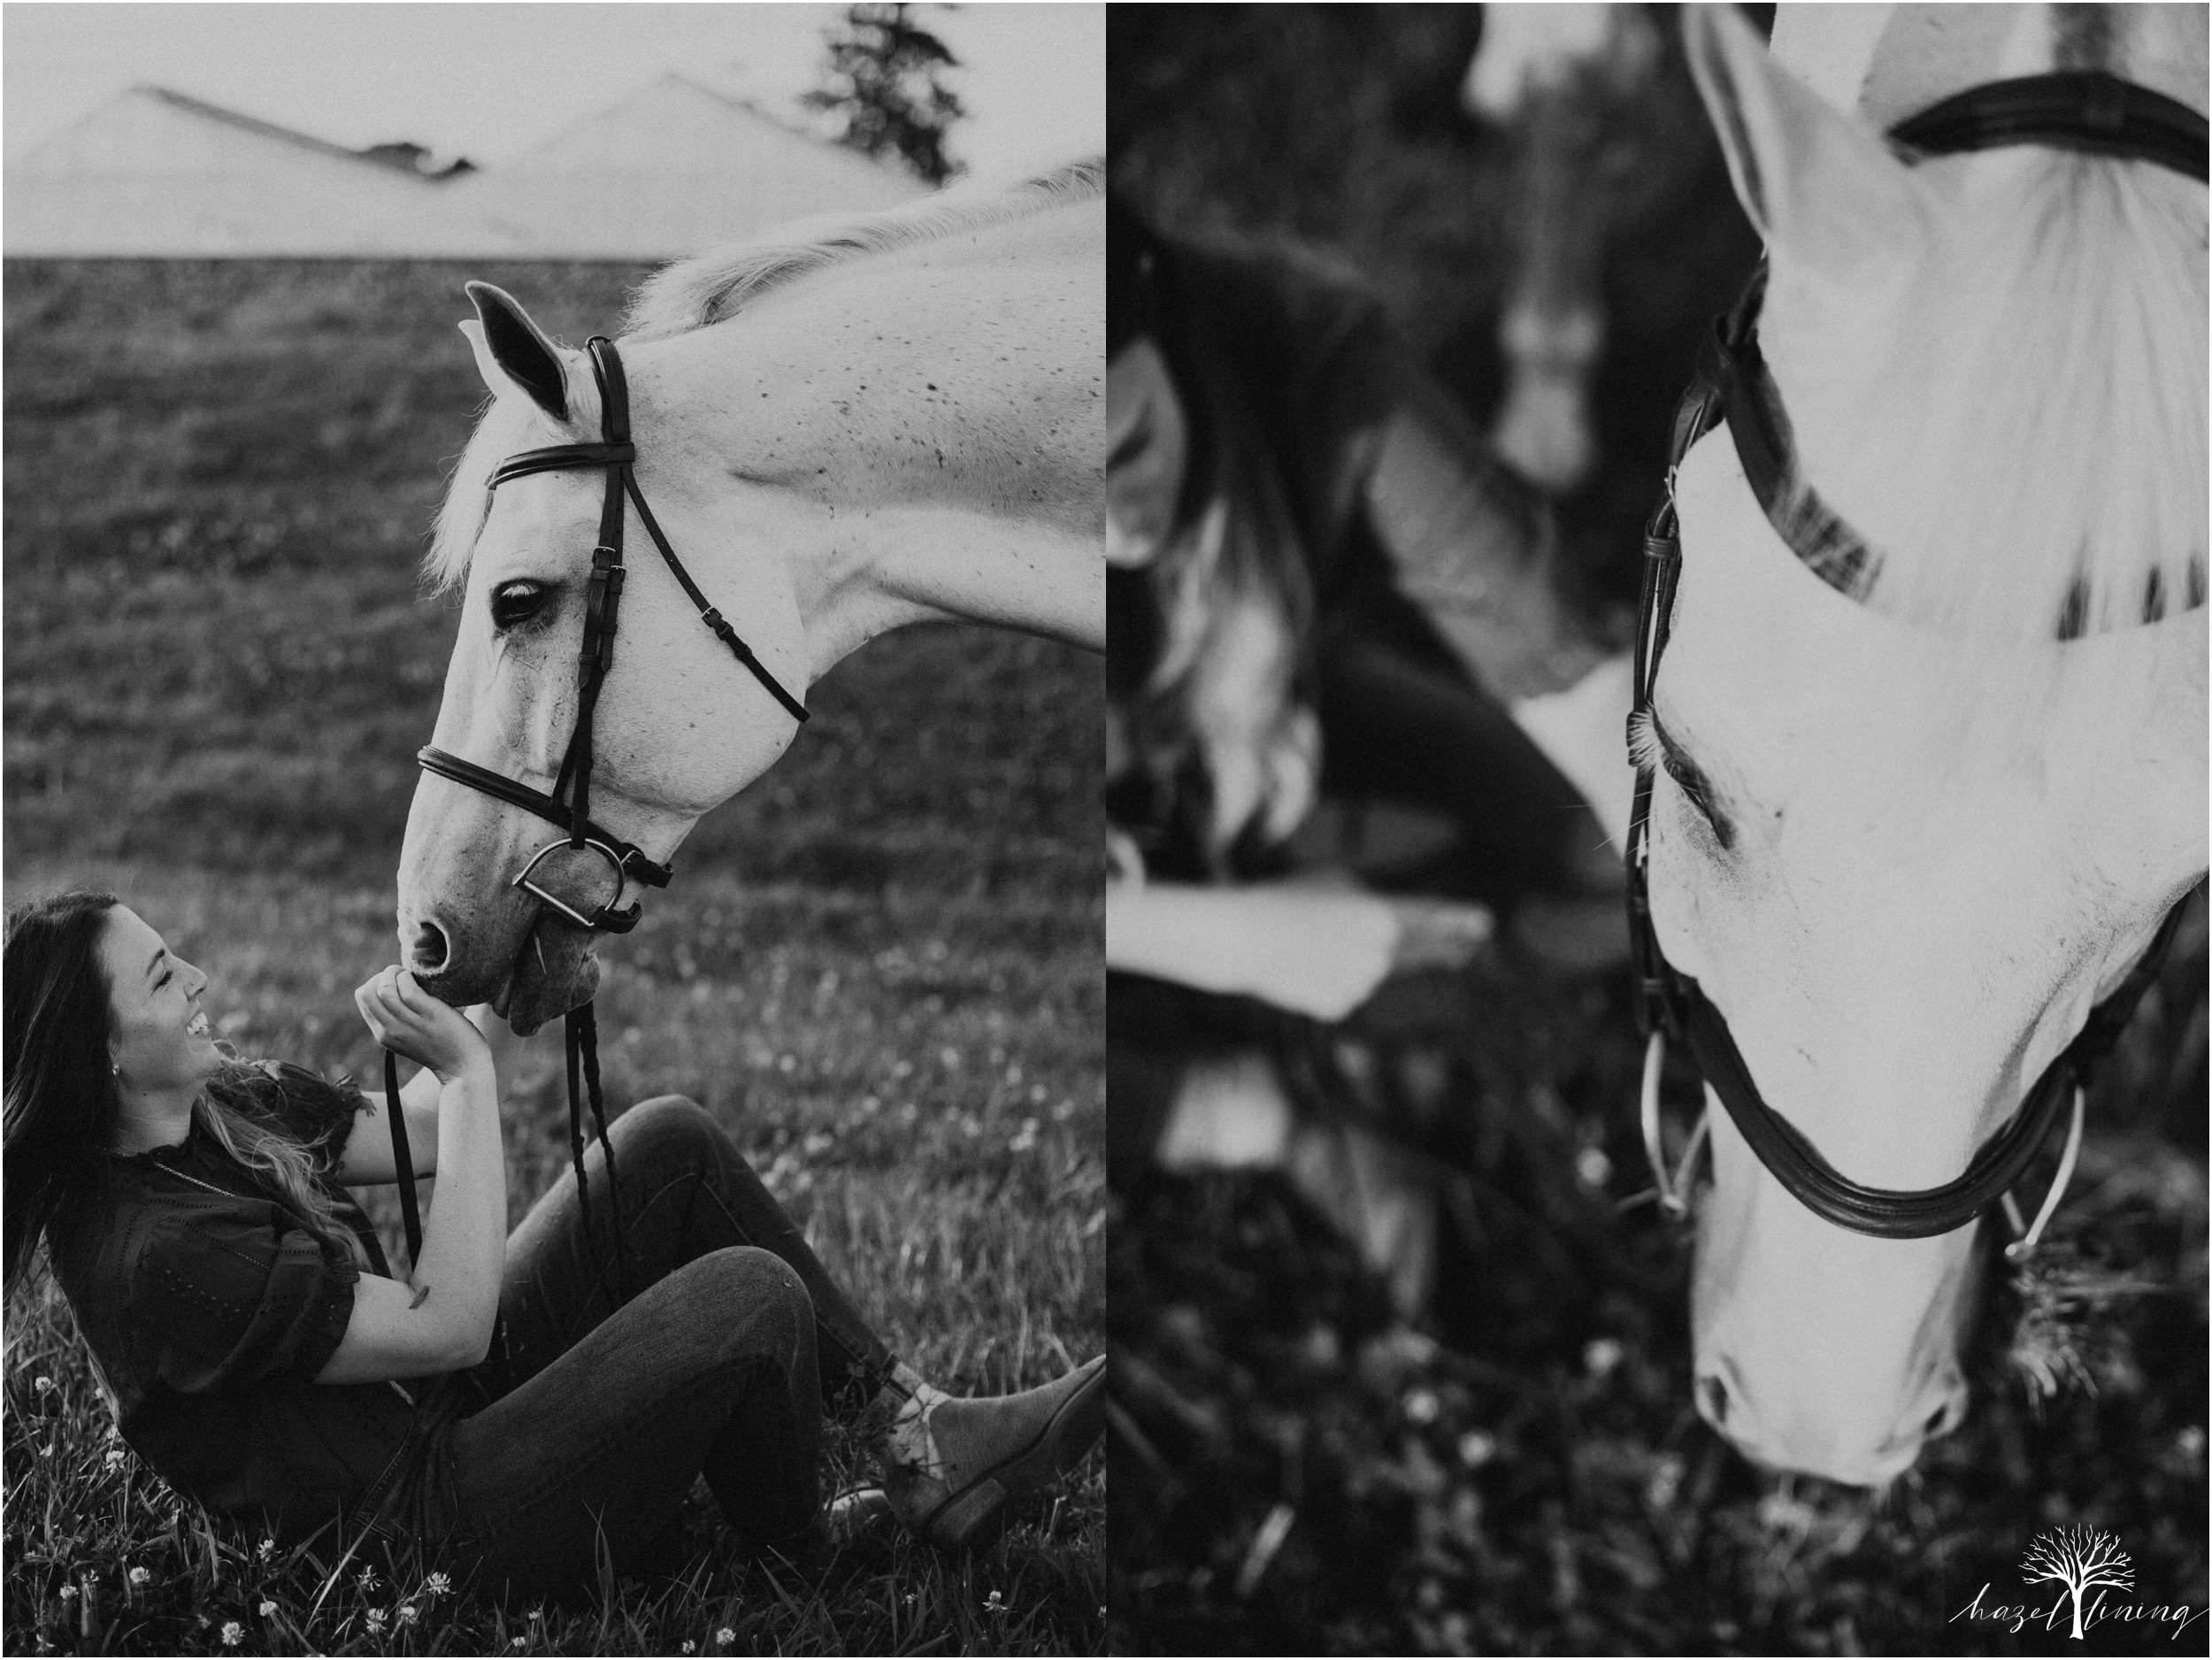 taylor-adams-and-horse-delaware-valley-university-delval-summer-equestrian-portrait-session-hazel-lining-photography-destination-elopement-wedding-engagement-photography_0023.jpg